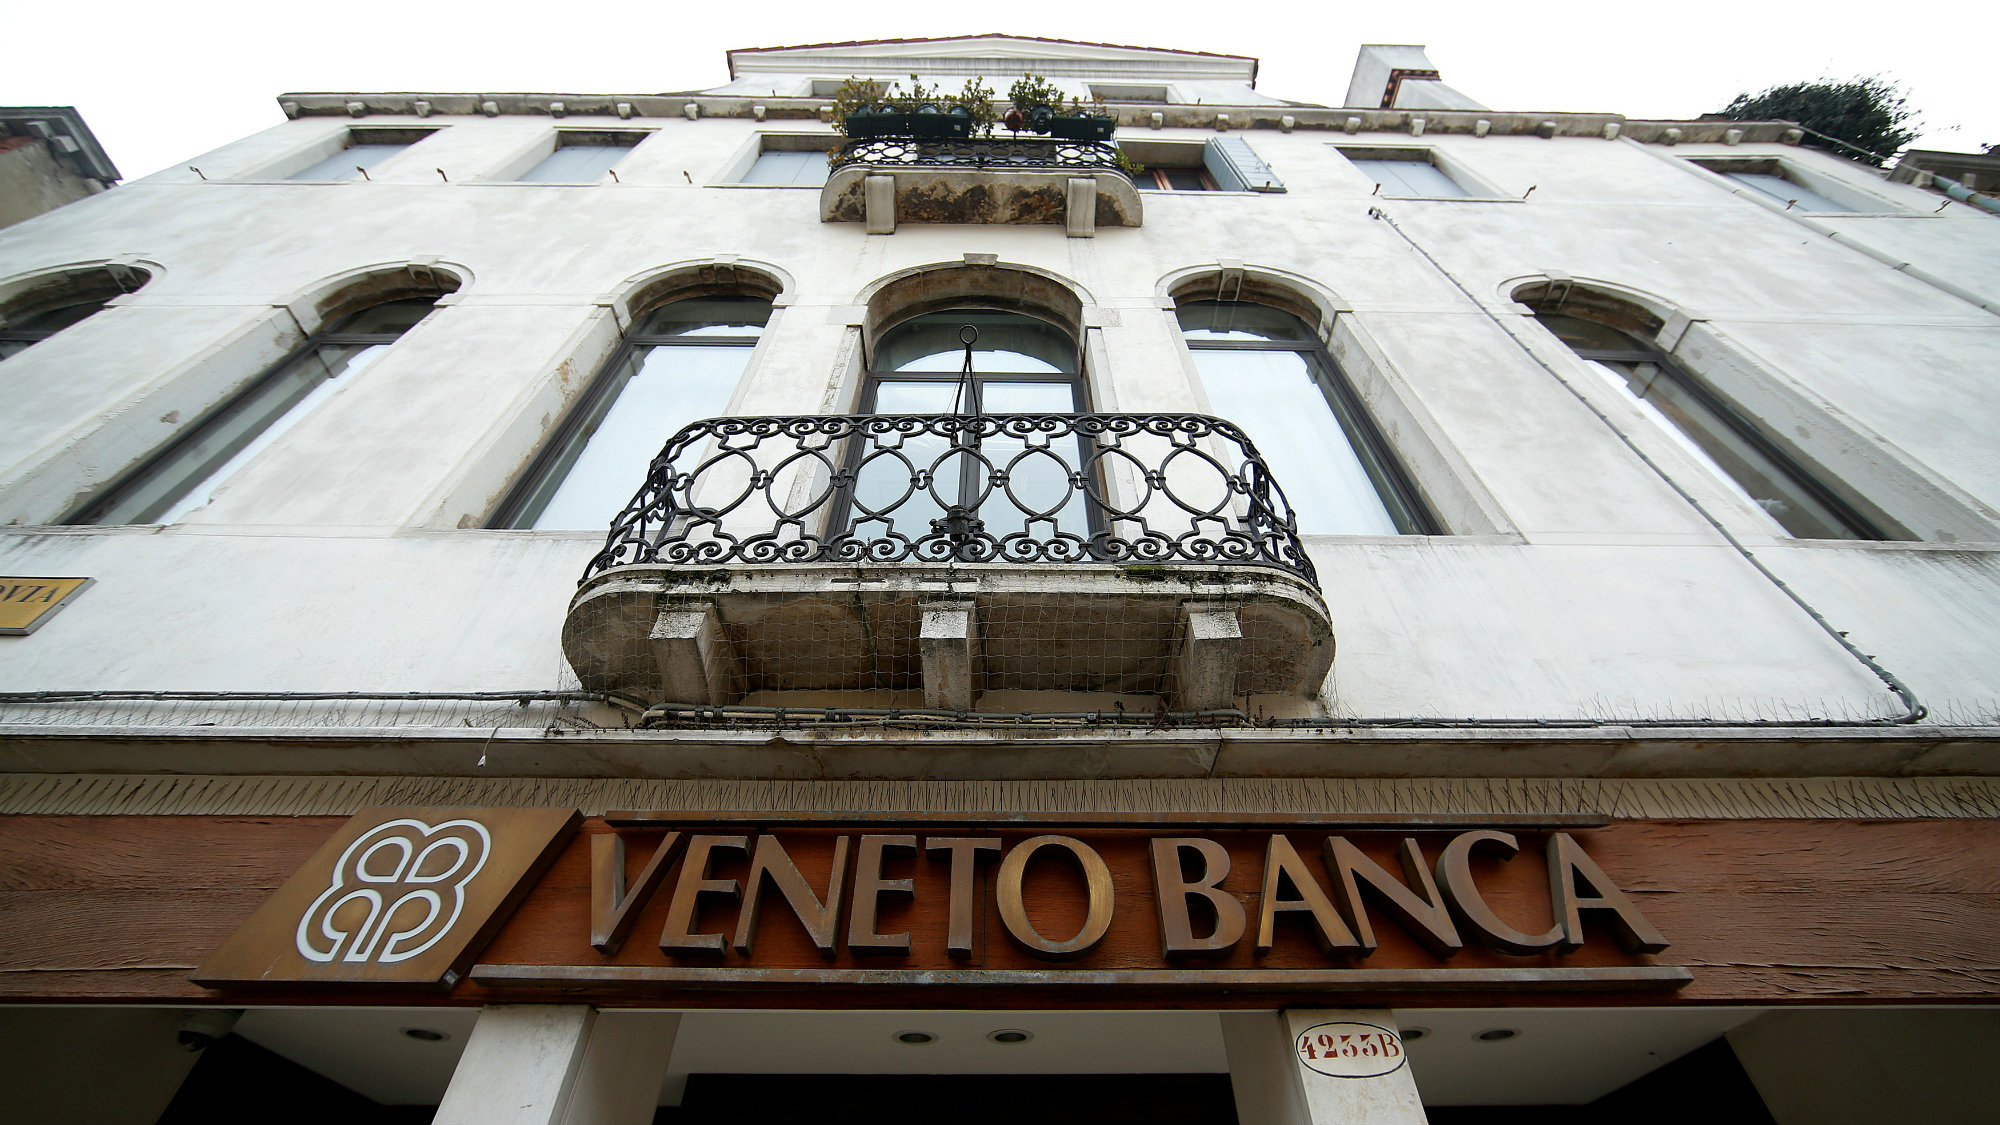 The logo of Veneto Banca bank is seen in Venice, Italy, January 31 2016.